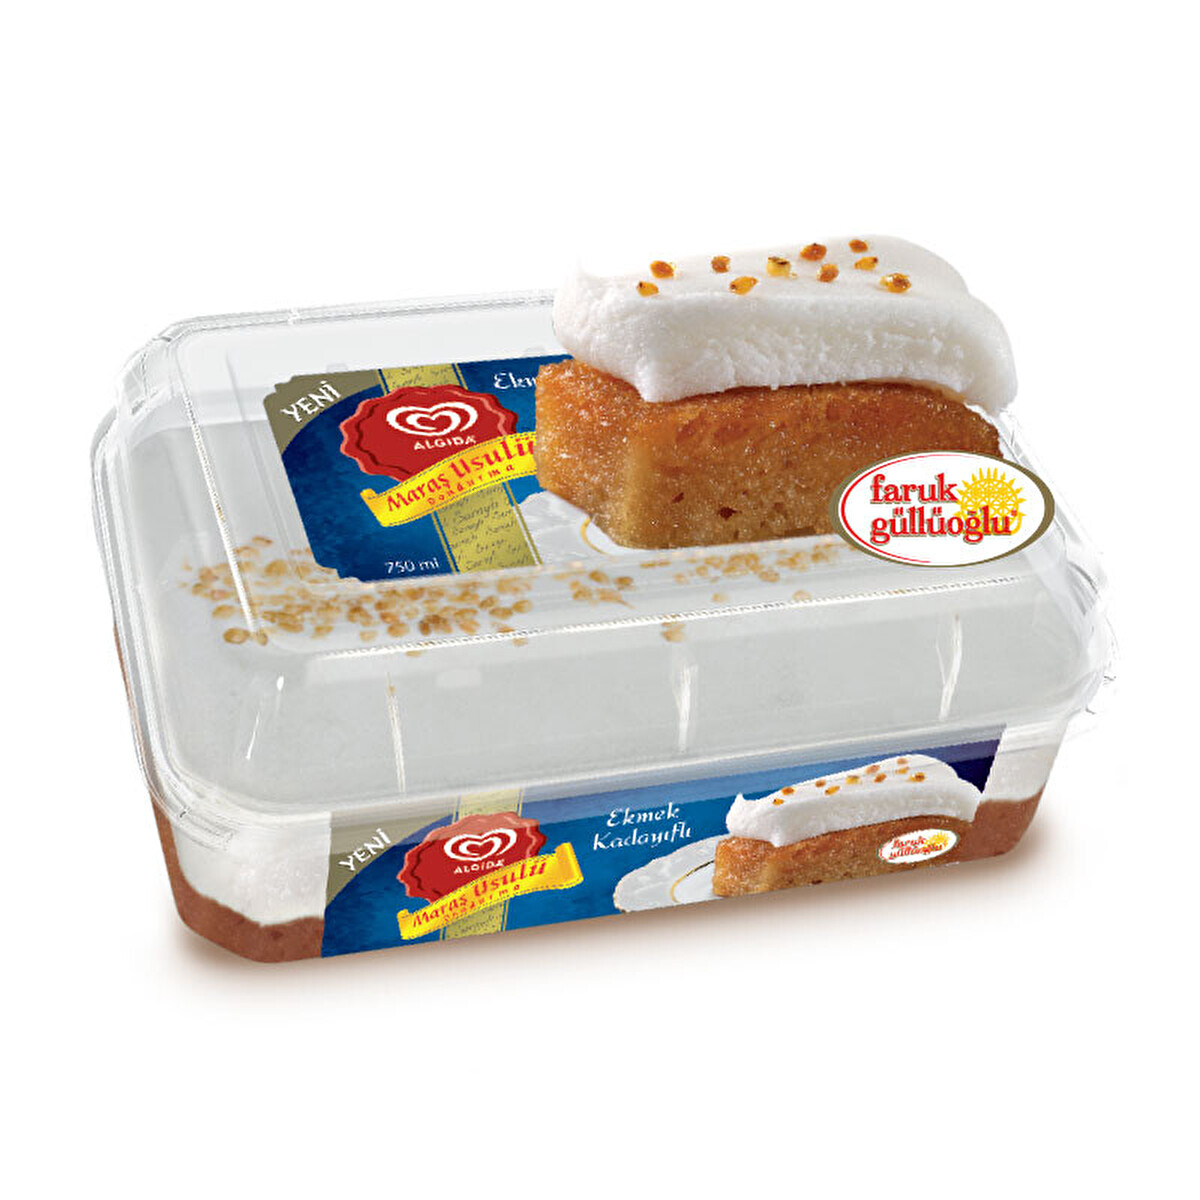 Algida Maraş Ekmek Kadayıf 750 Ml 30141514 Carrefoursa